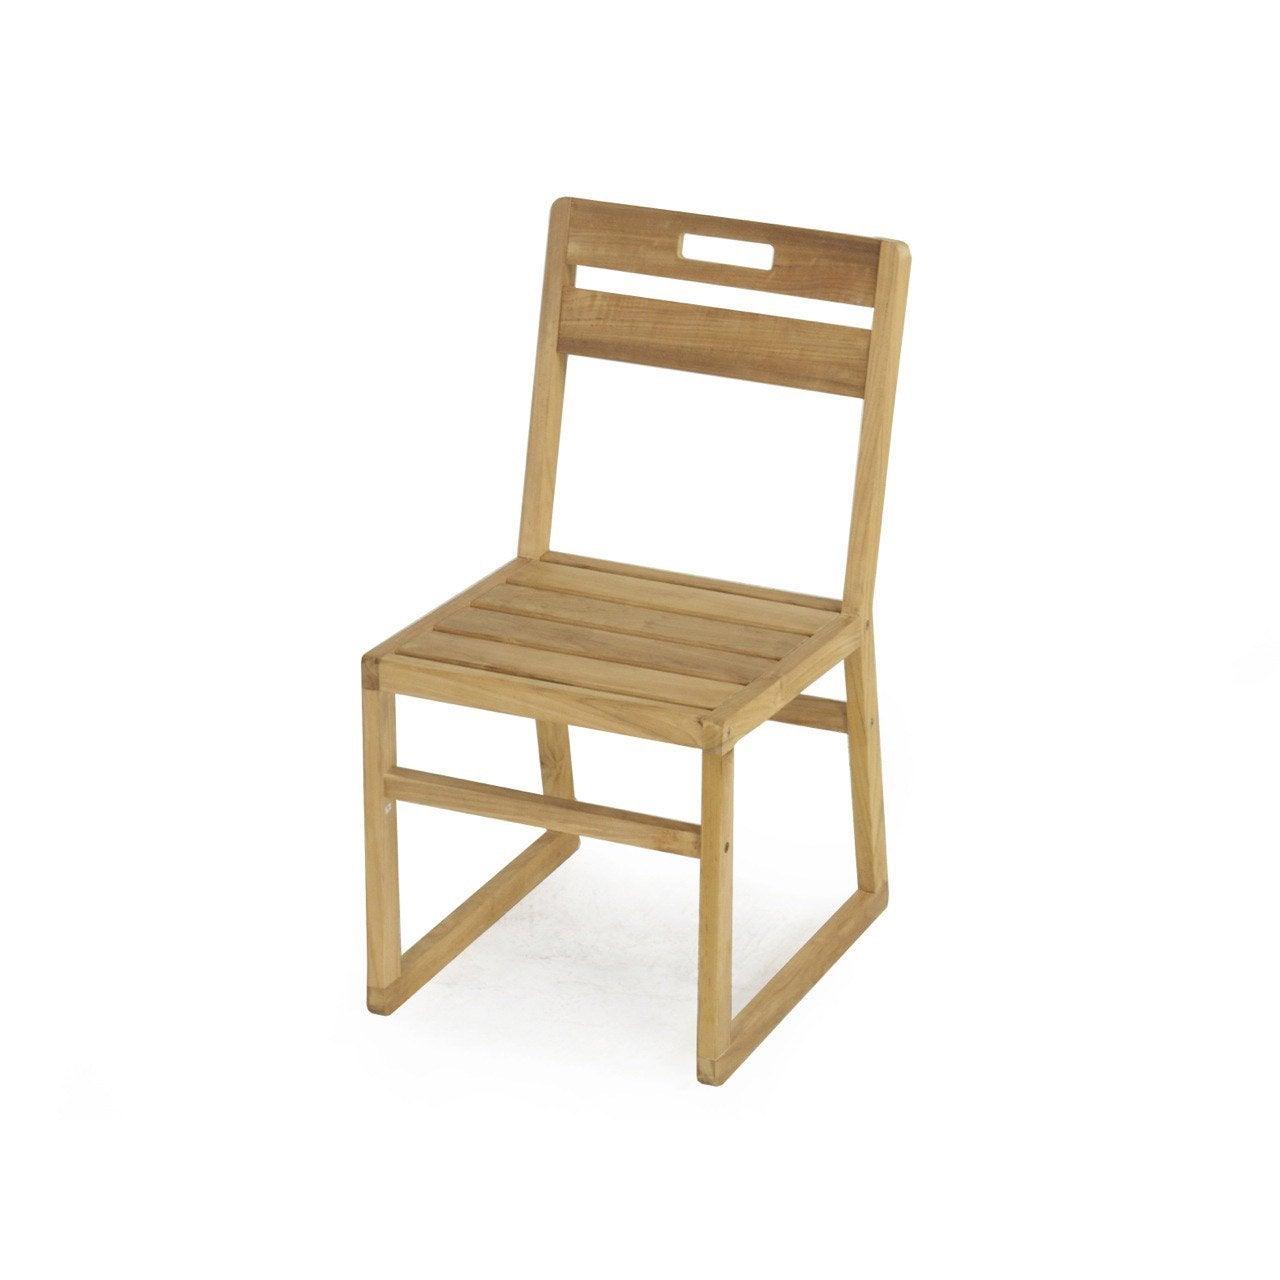 Chaise de jardin en bois resort naturel leroy merlin - Chaise de jardin en bois ...